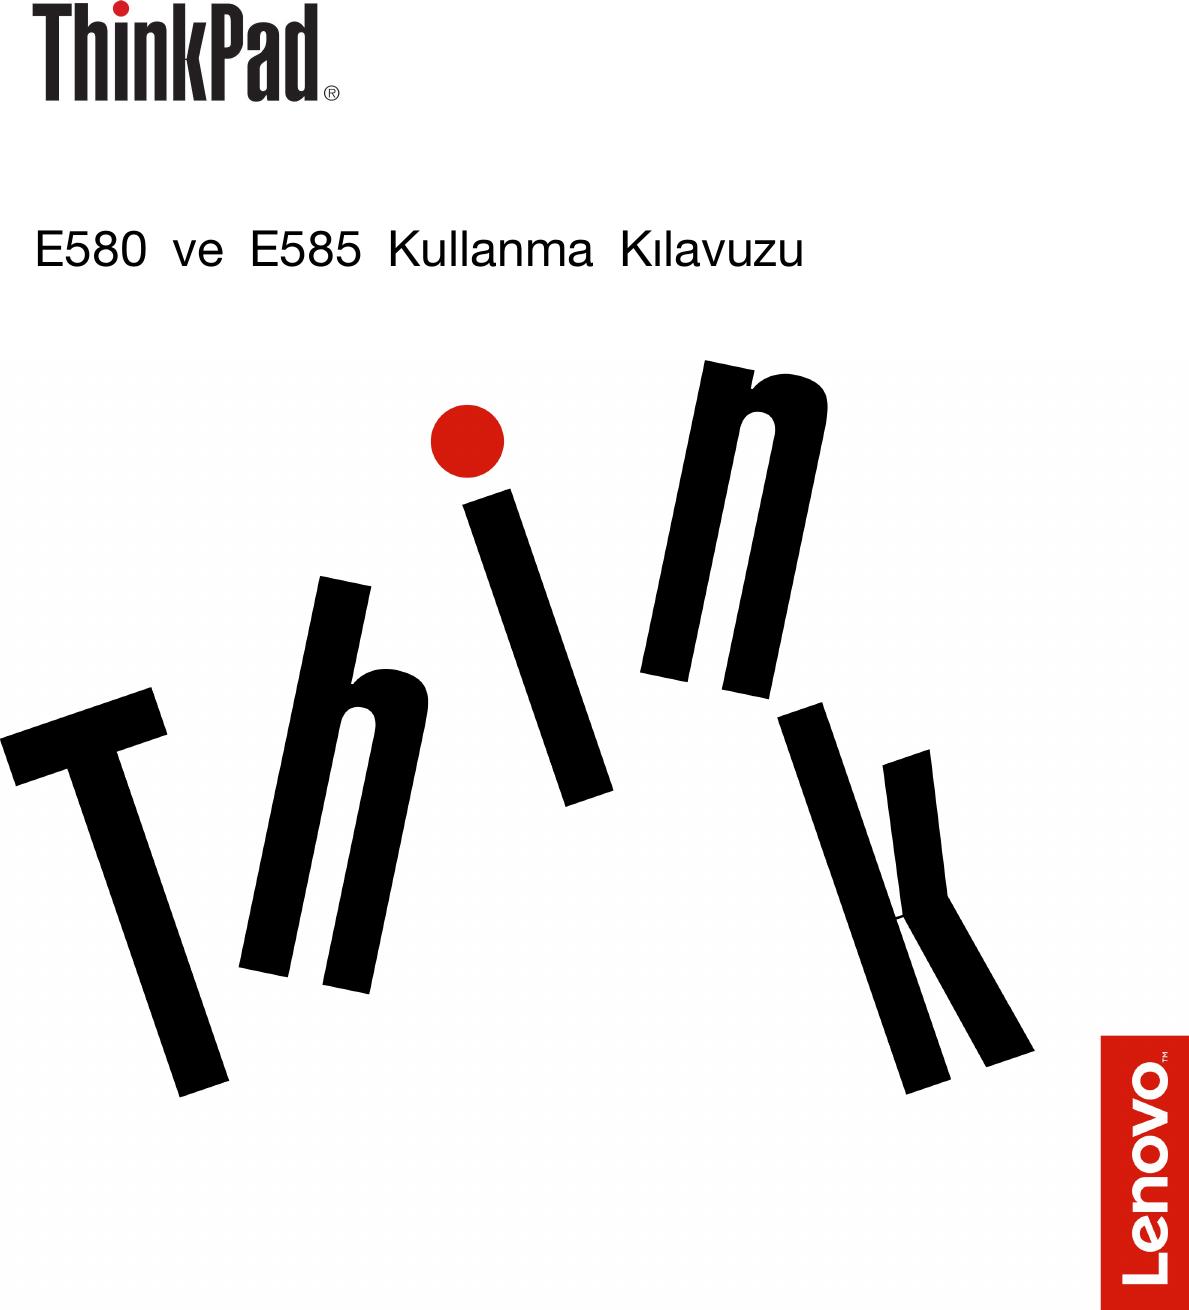 Lenovo E580 Ve E585 Kullanma Kılavuzu (Turkish) User Guide